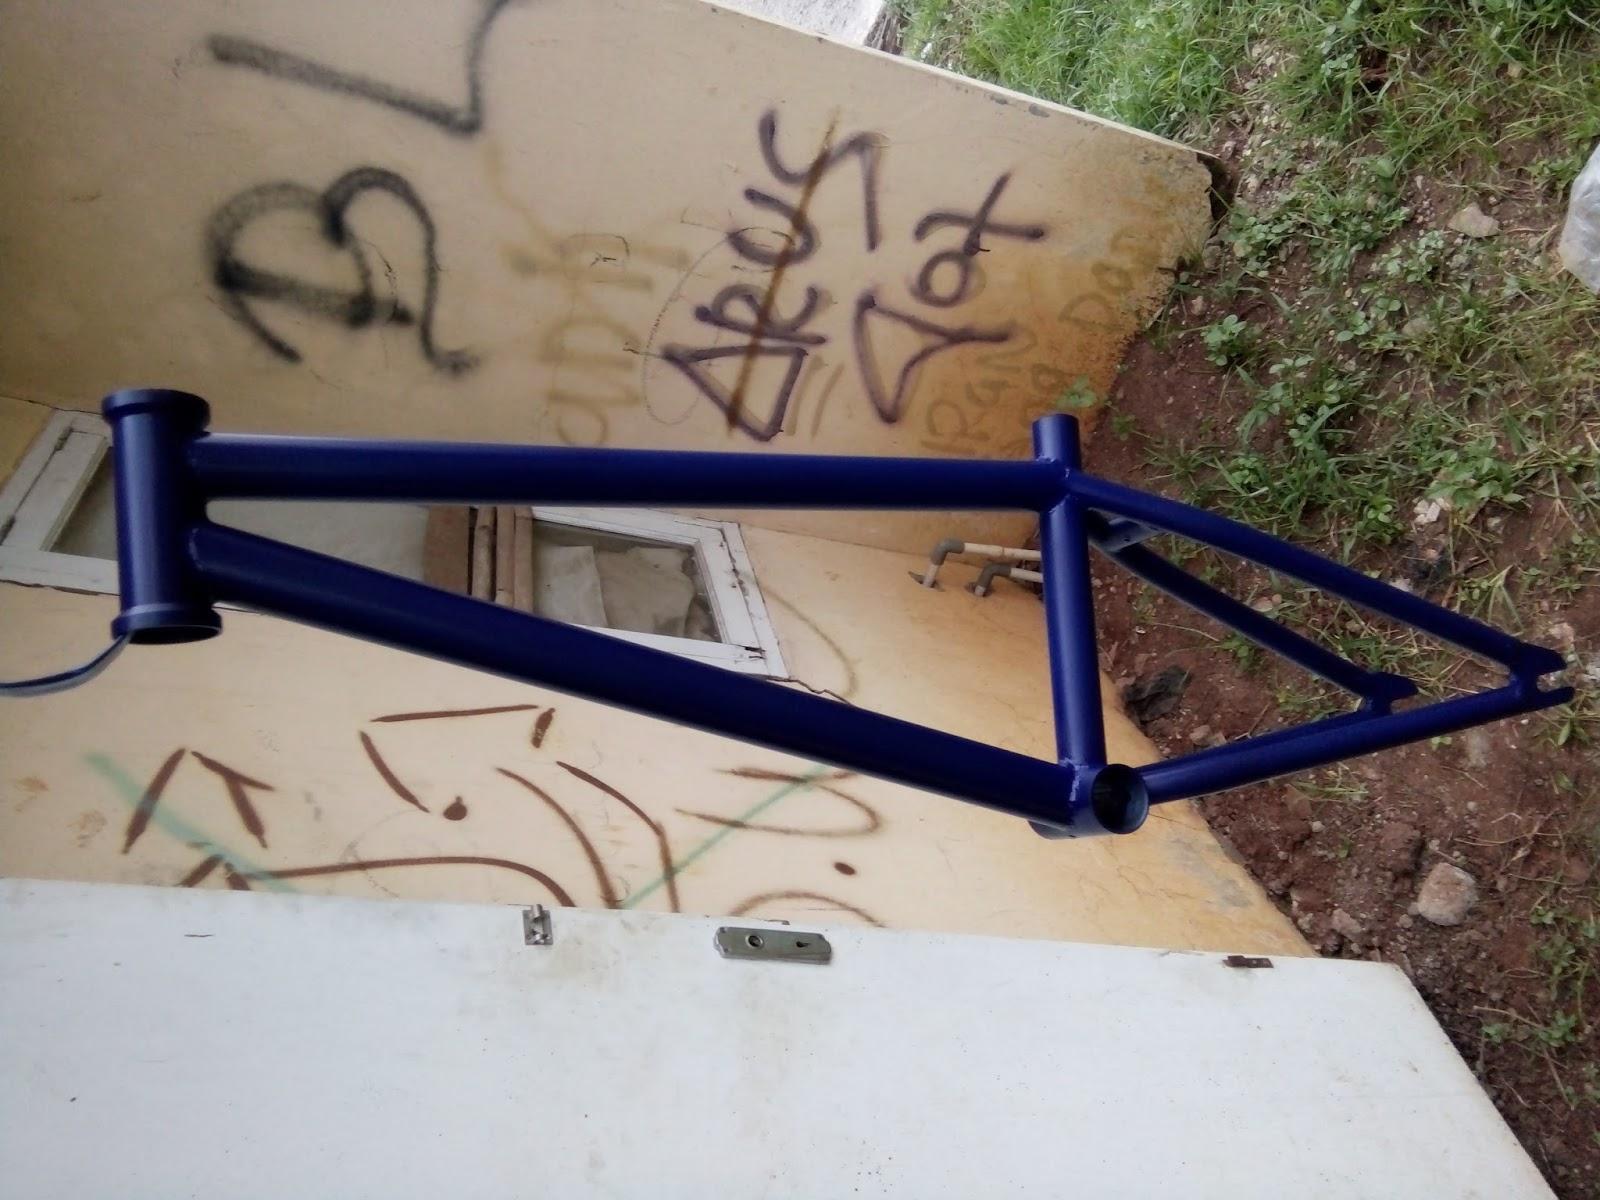 Frame BMX FLATLAND 2016 AGGBIKE